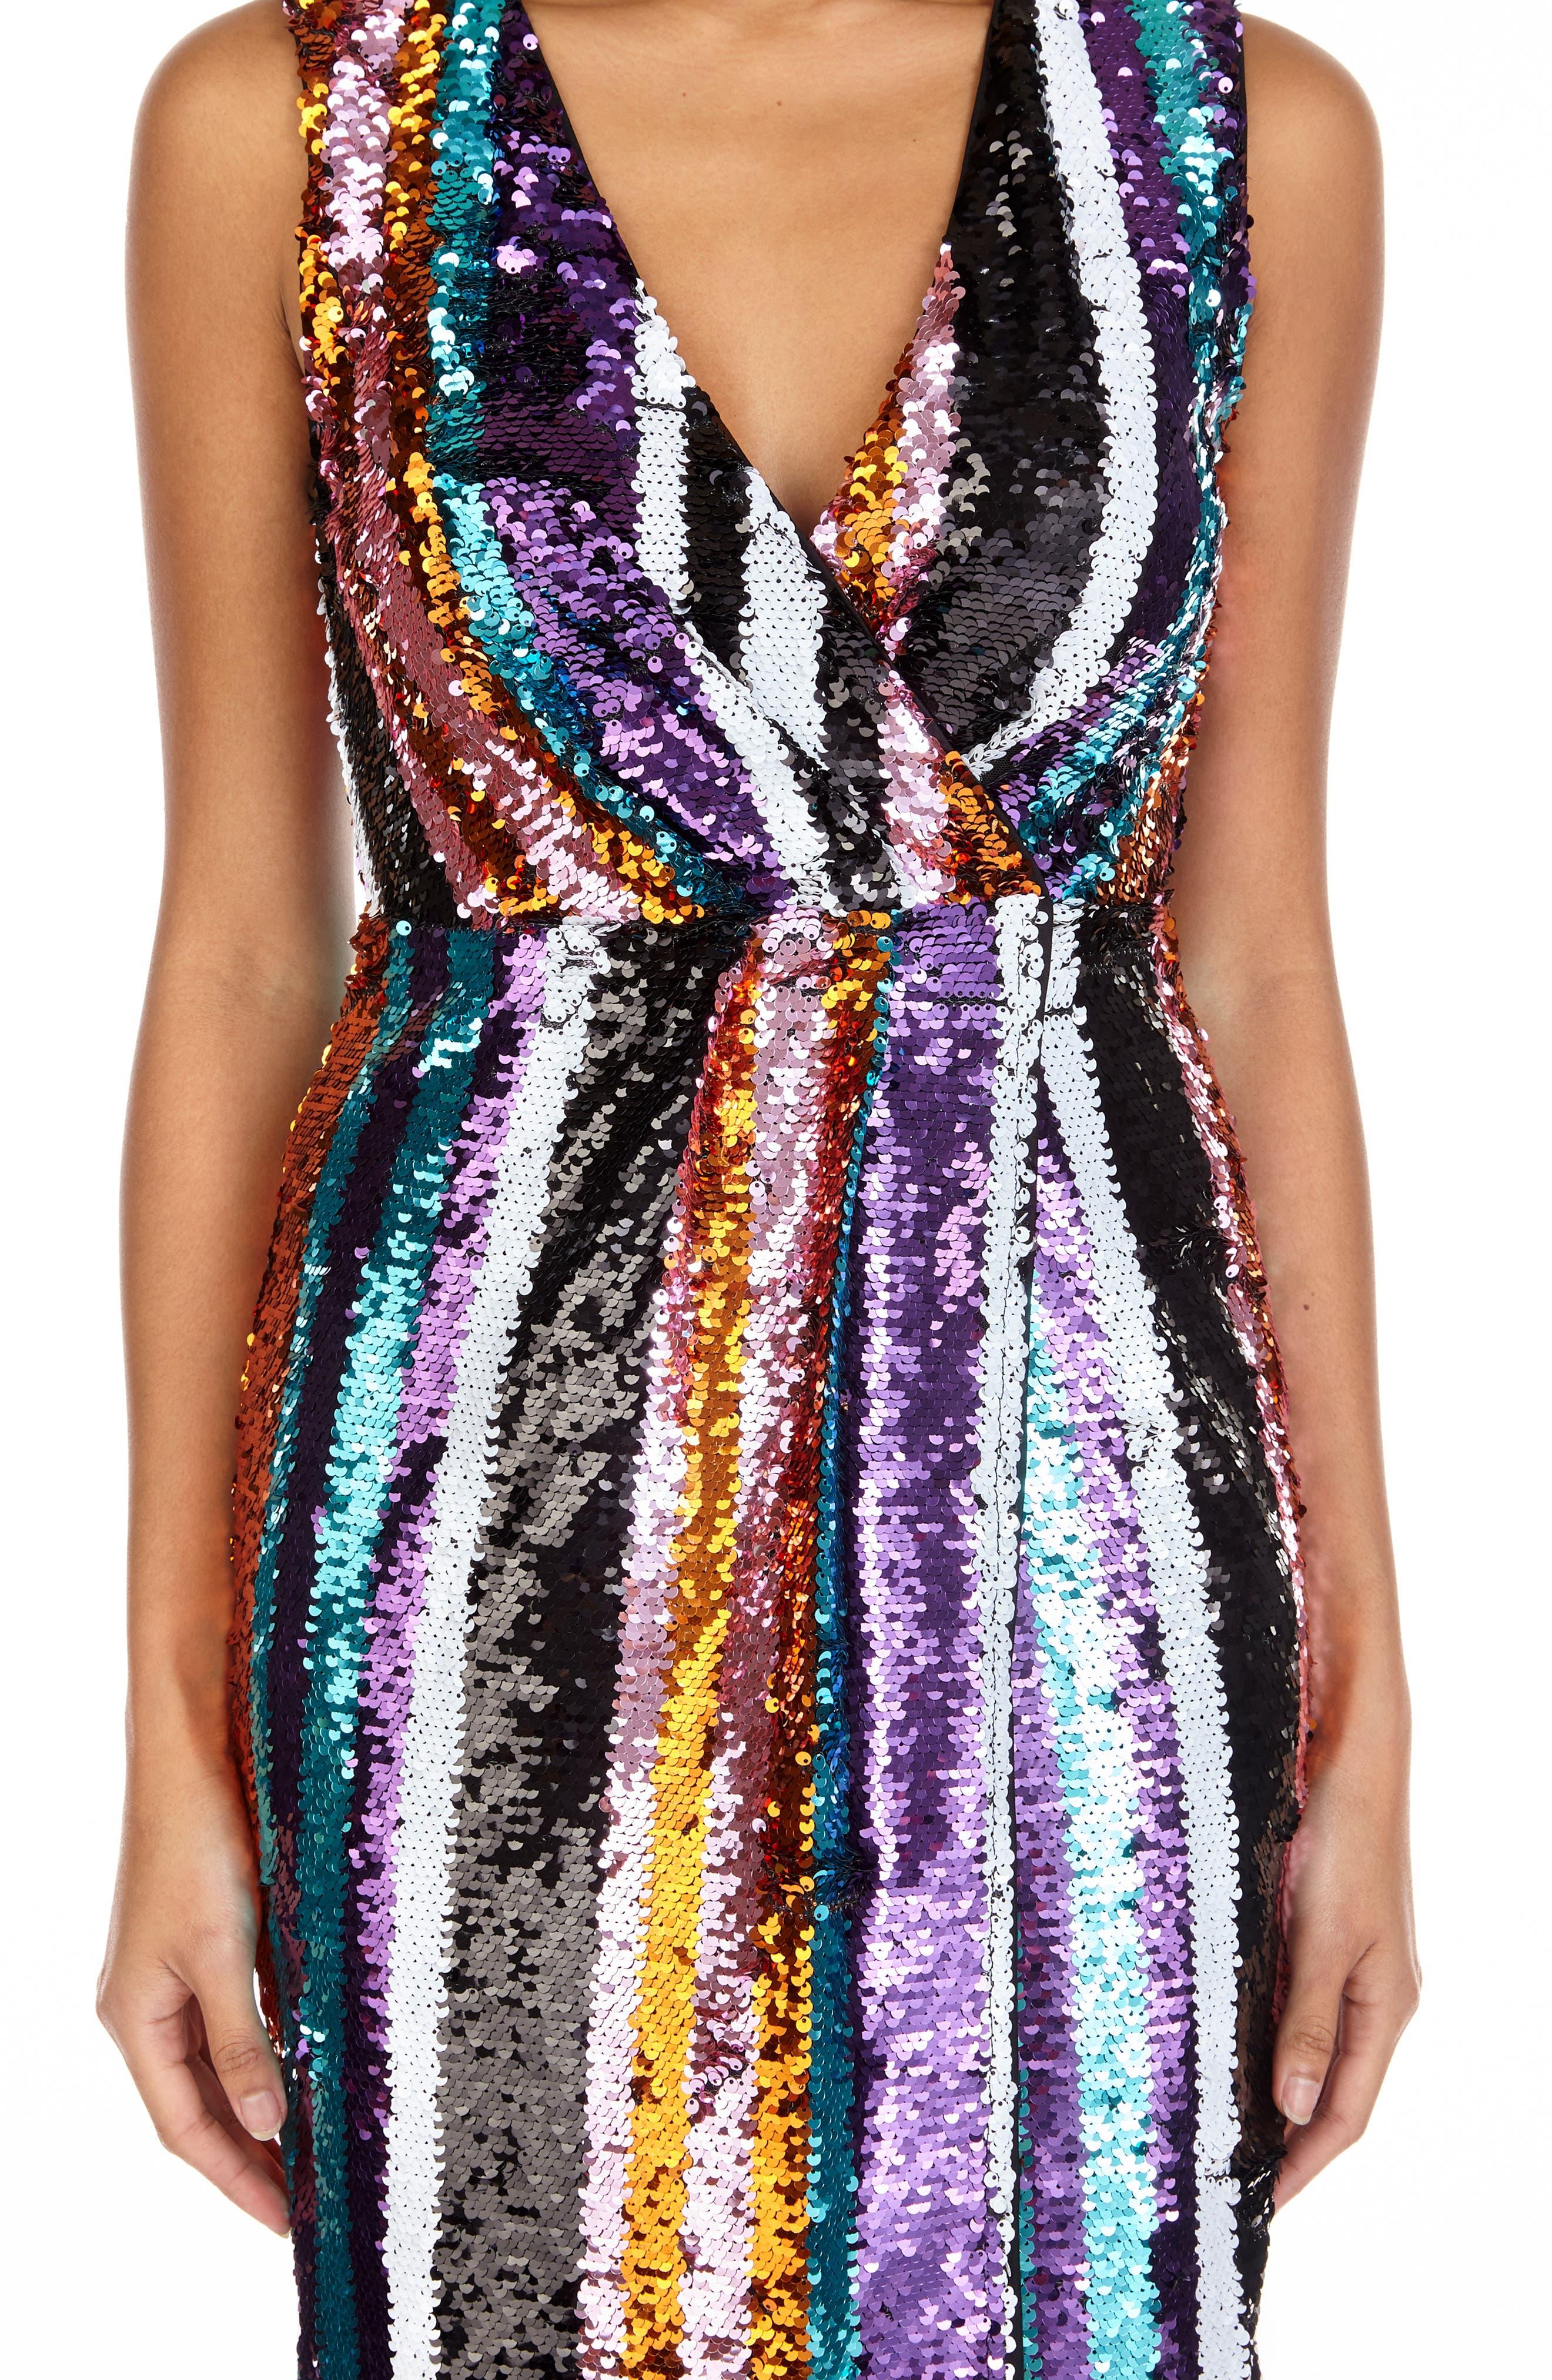 Sarah Rainbow Sequin Stripe Cocktail Sheath,                             Alternate thumbnail 3, color,                             MULTI PURPLE